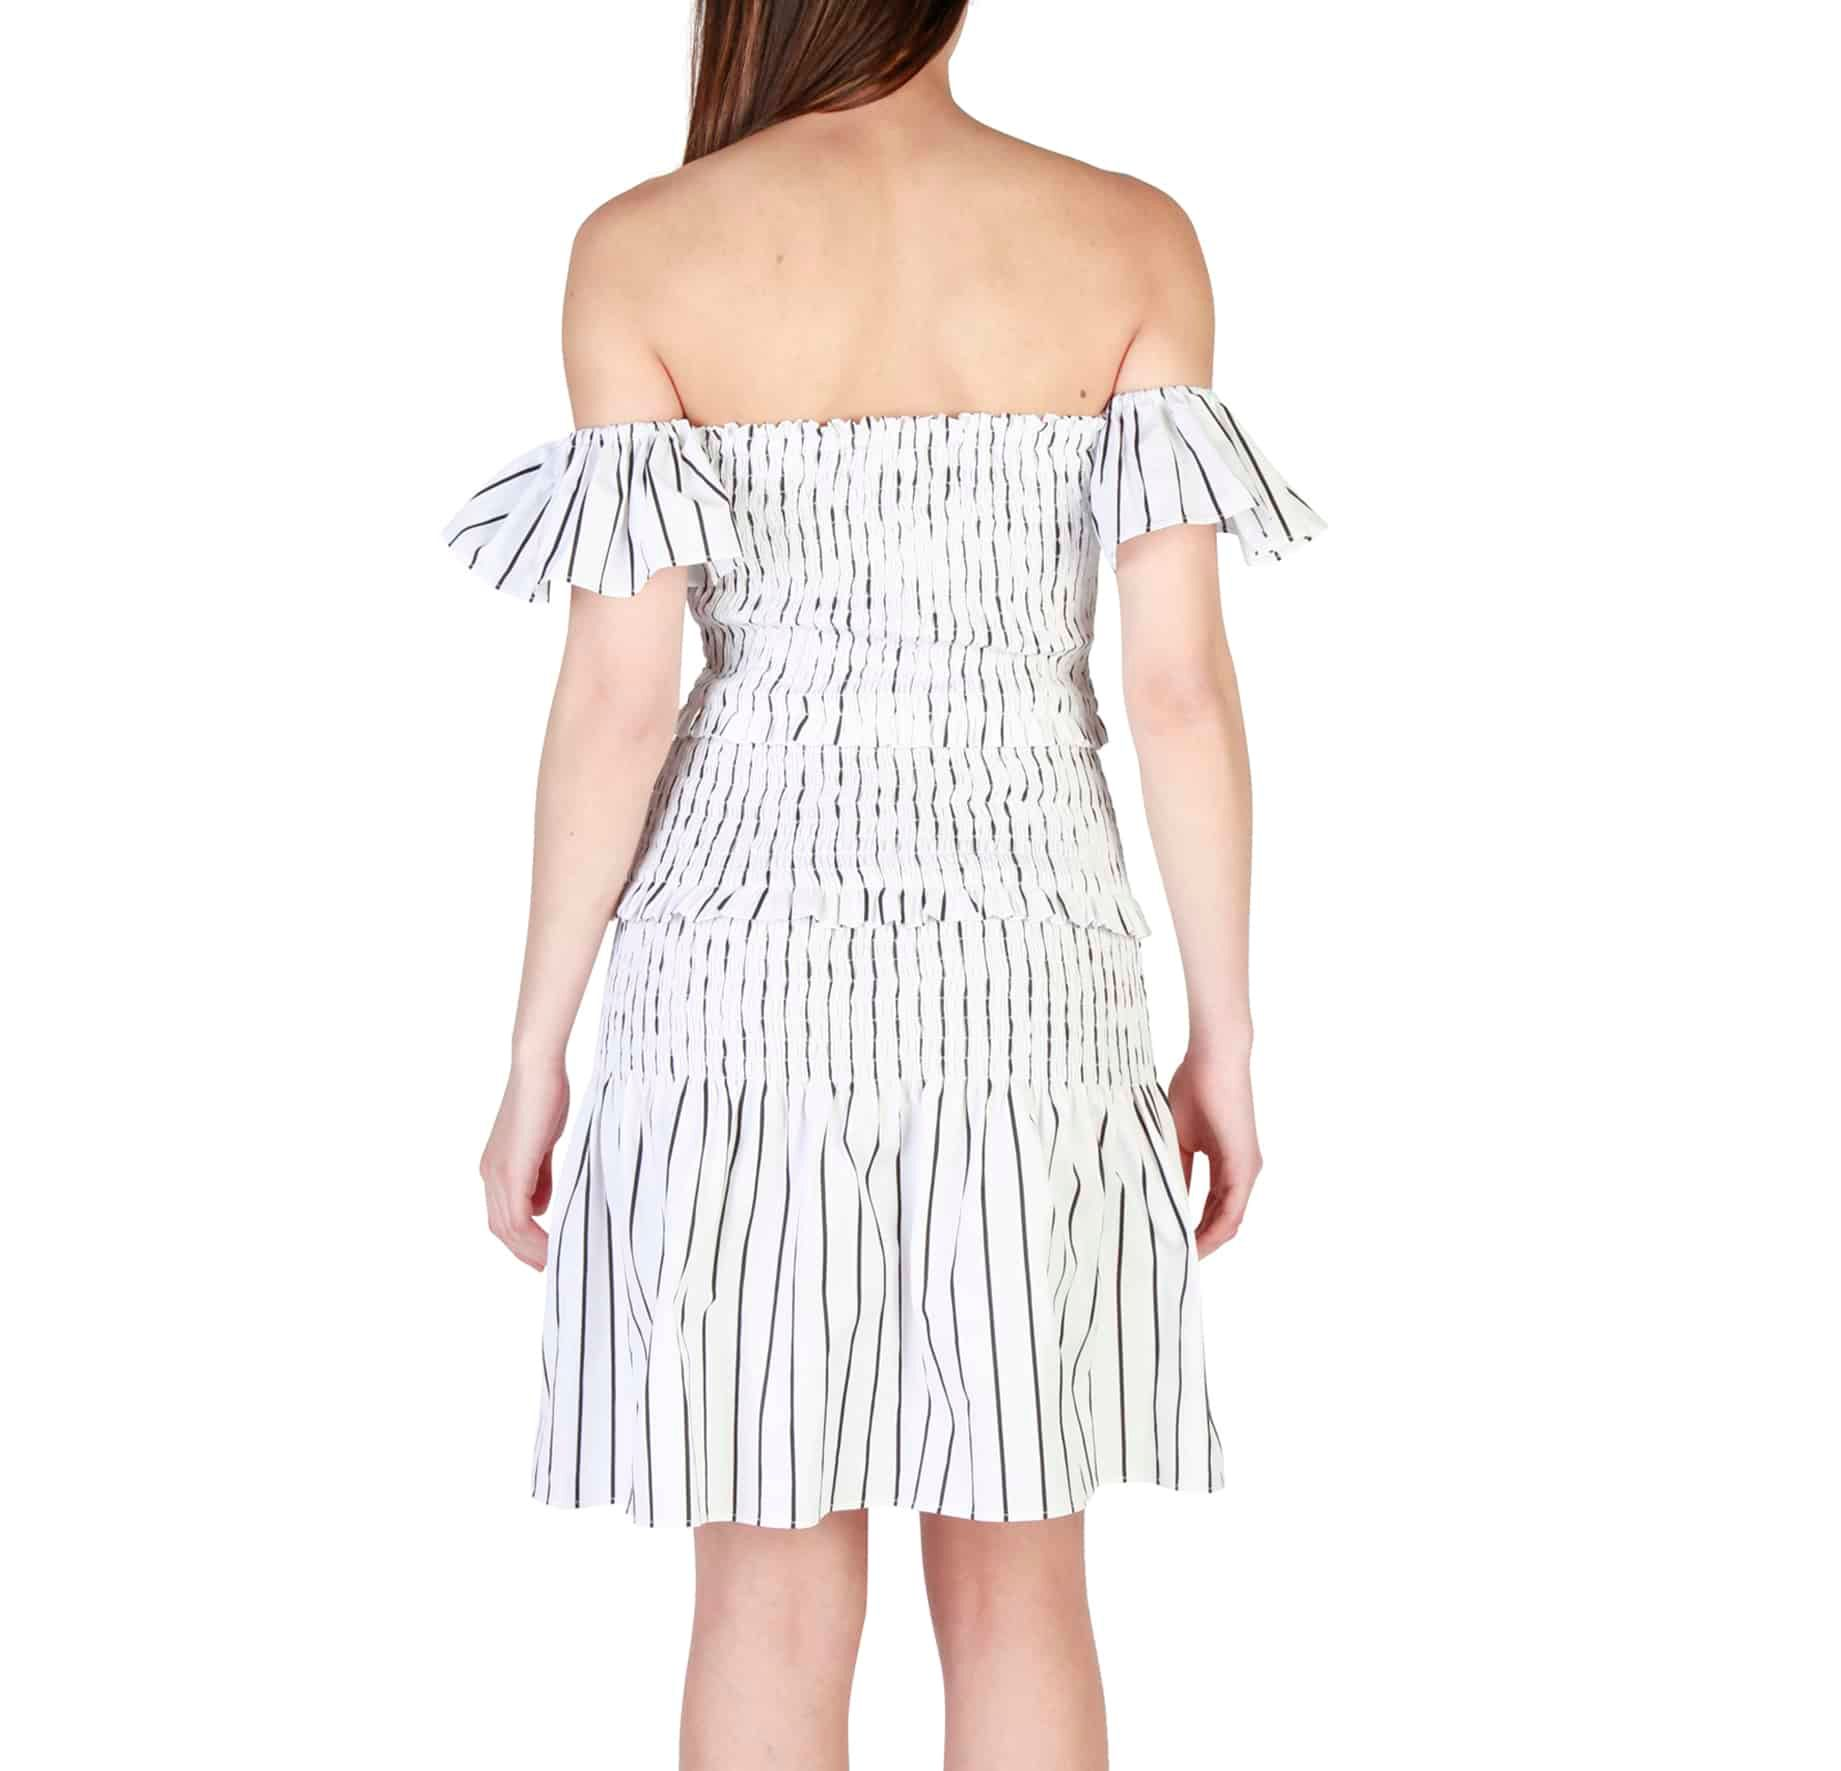 Clothing Pinko – 1G130W_6806